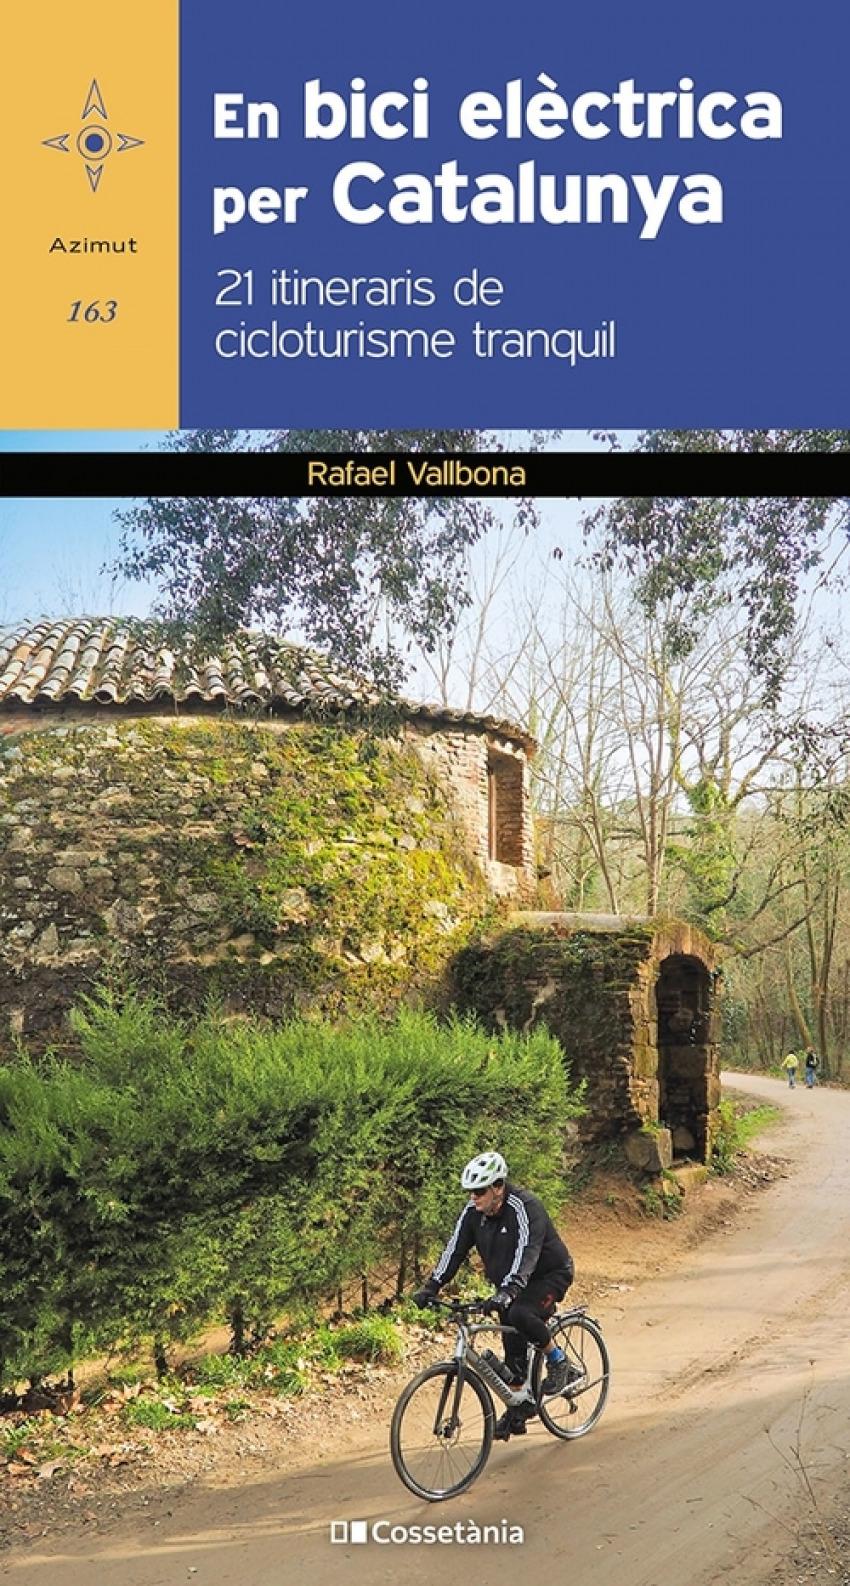 En bici elèctrica per Catalunya